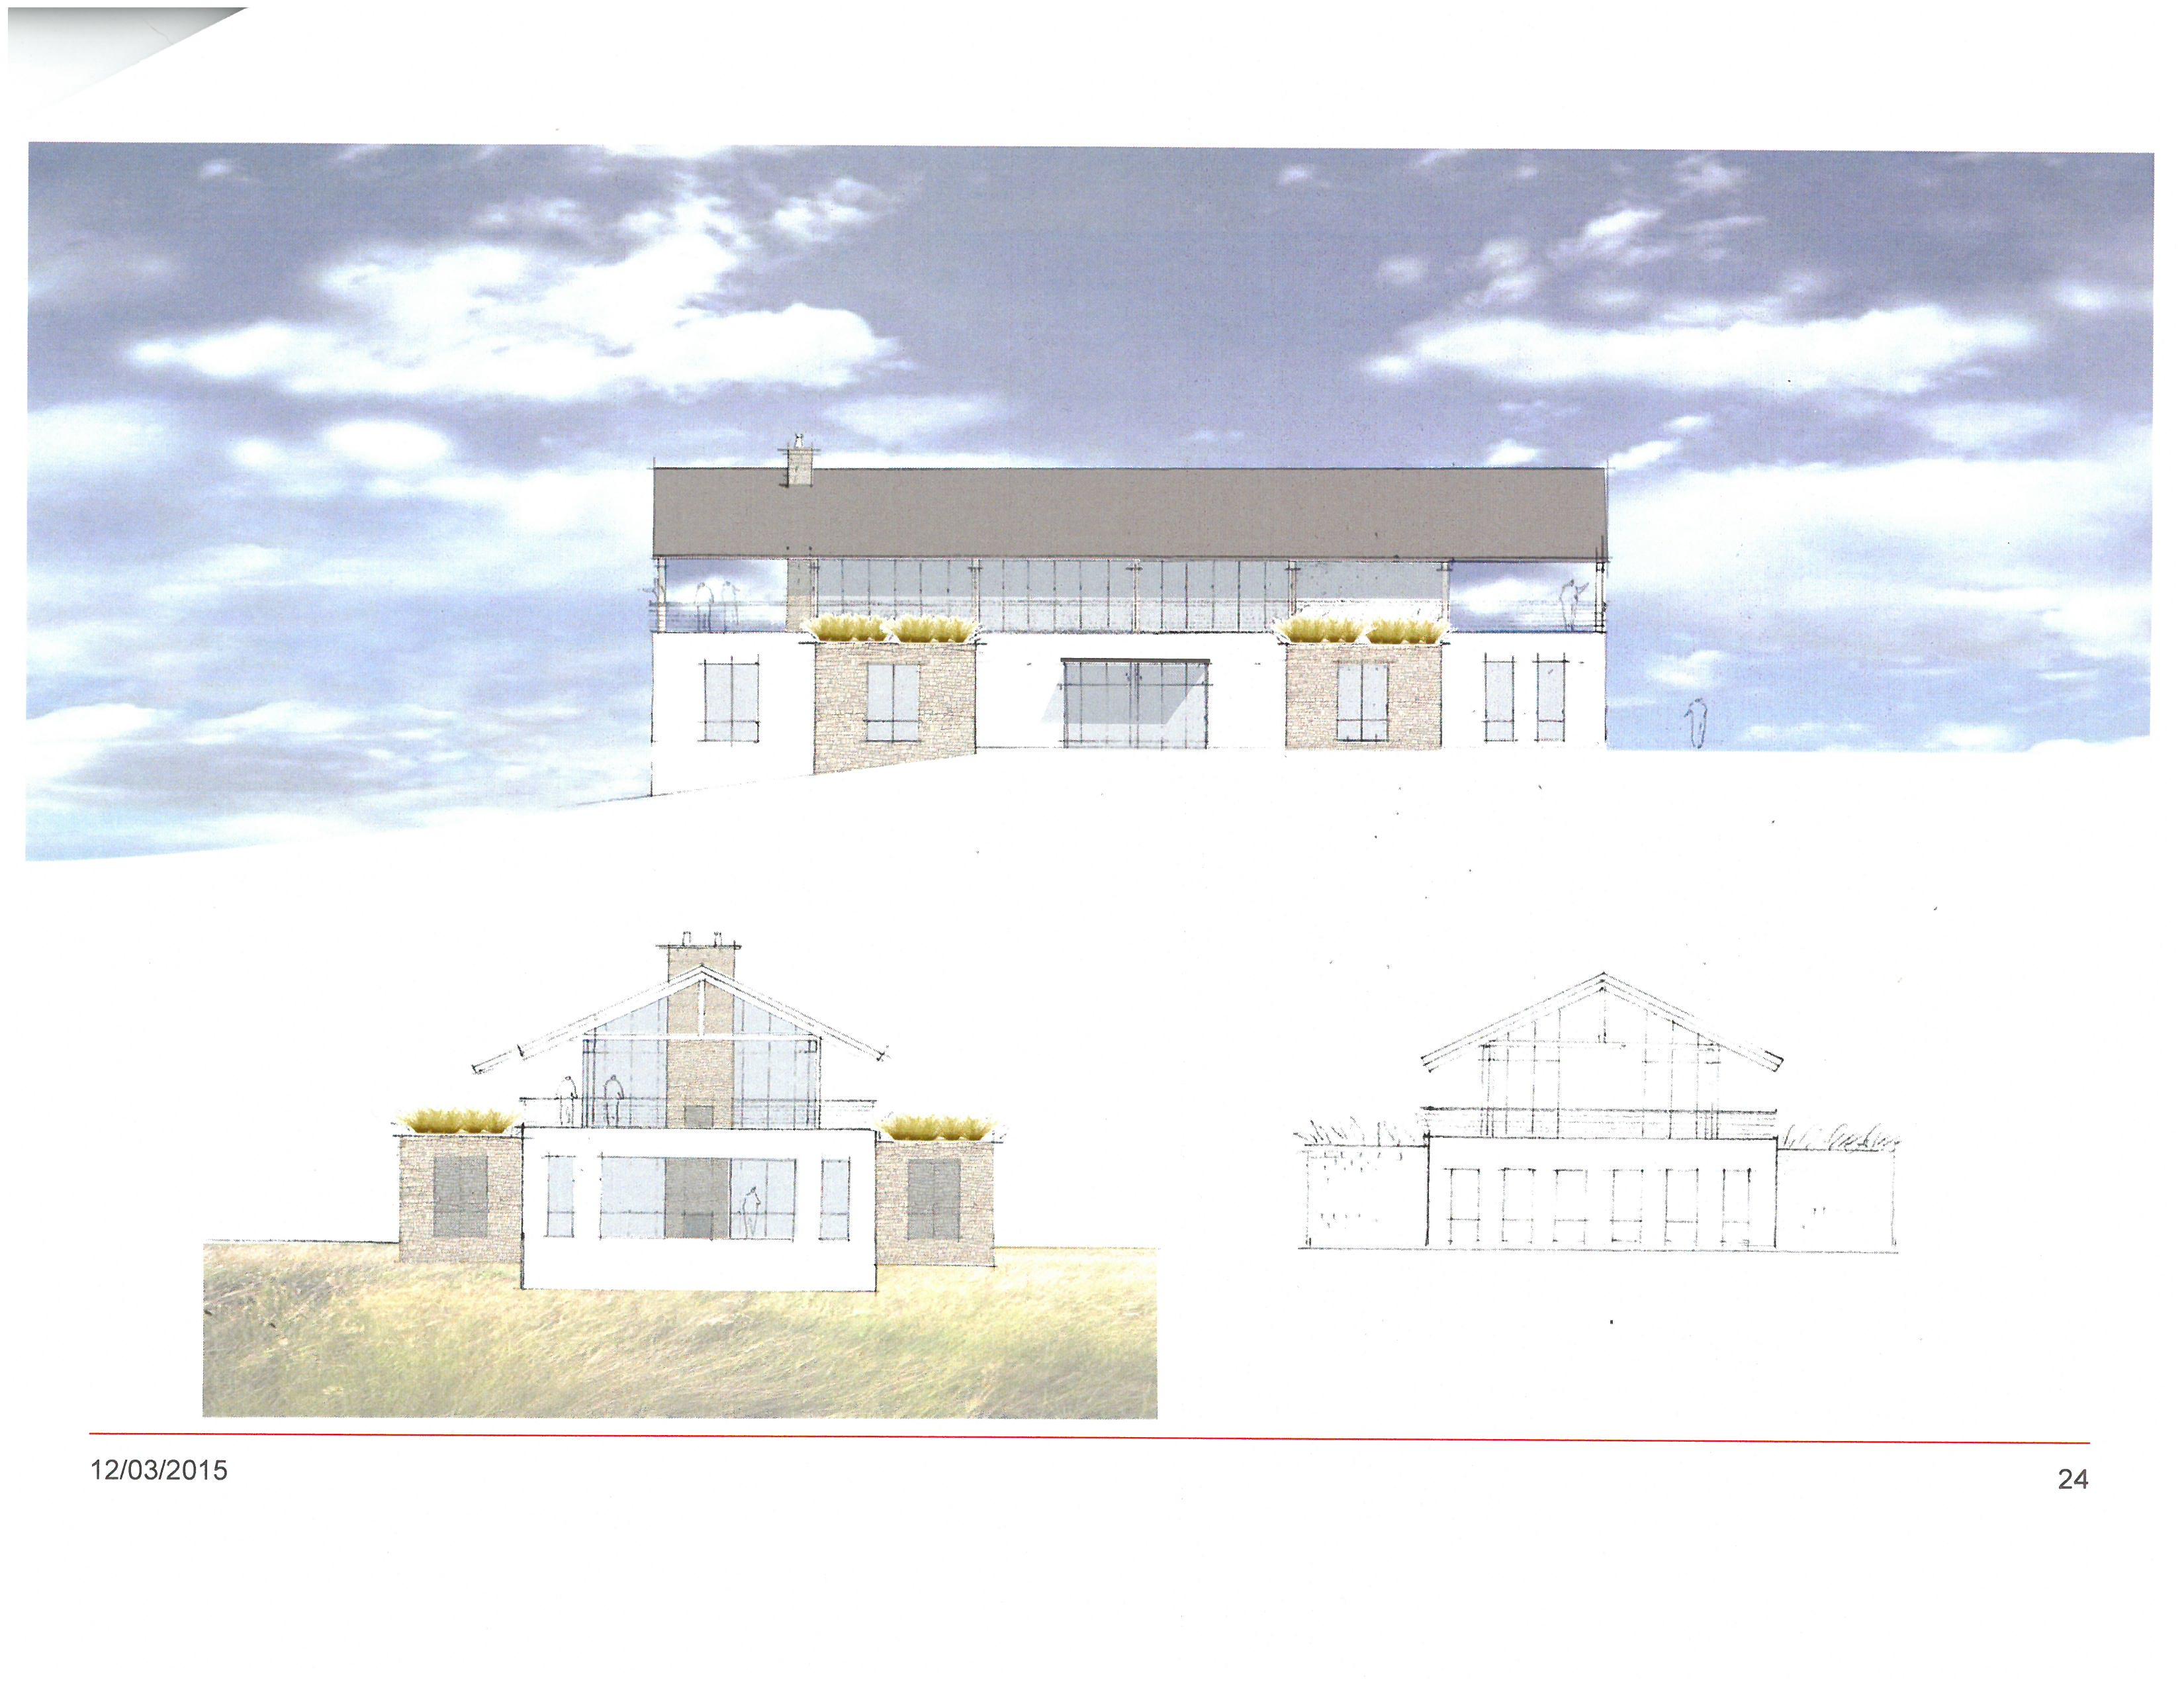 Egg Harbor Library Design Based on Rock Island Boathouse